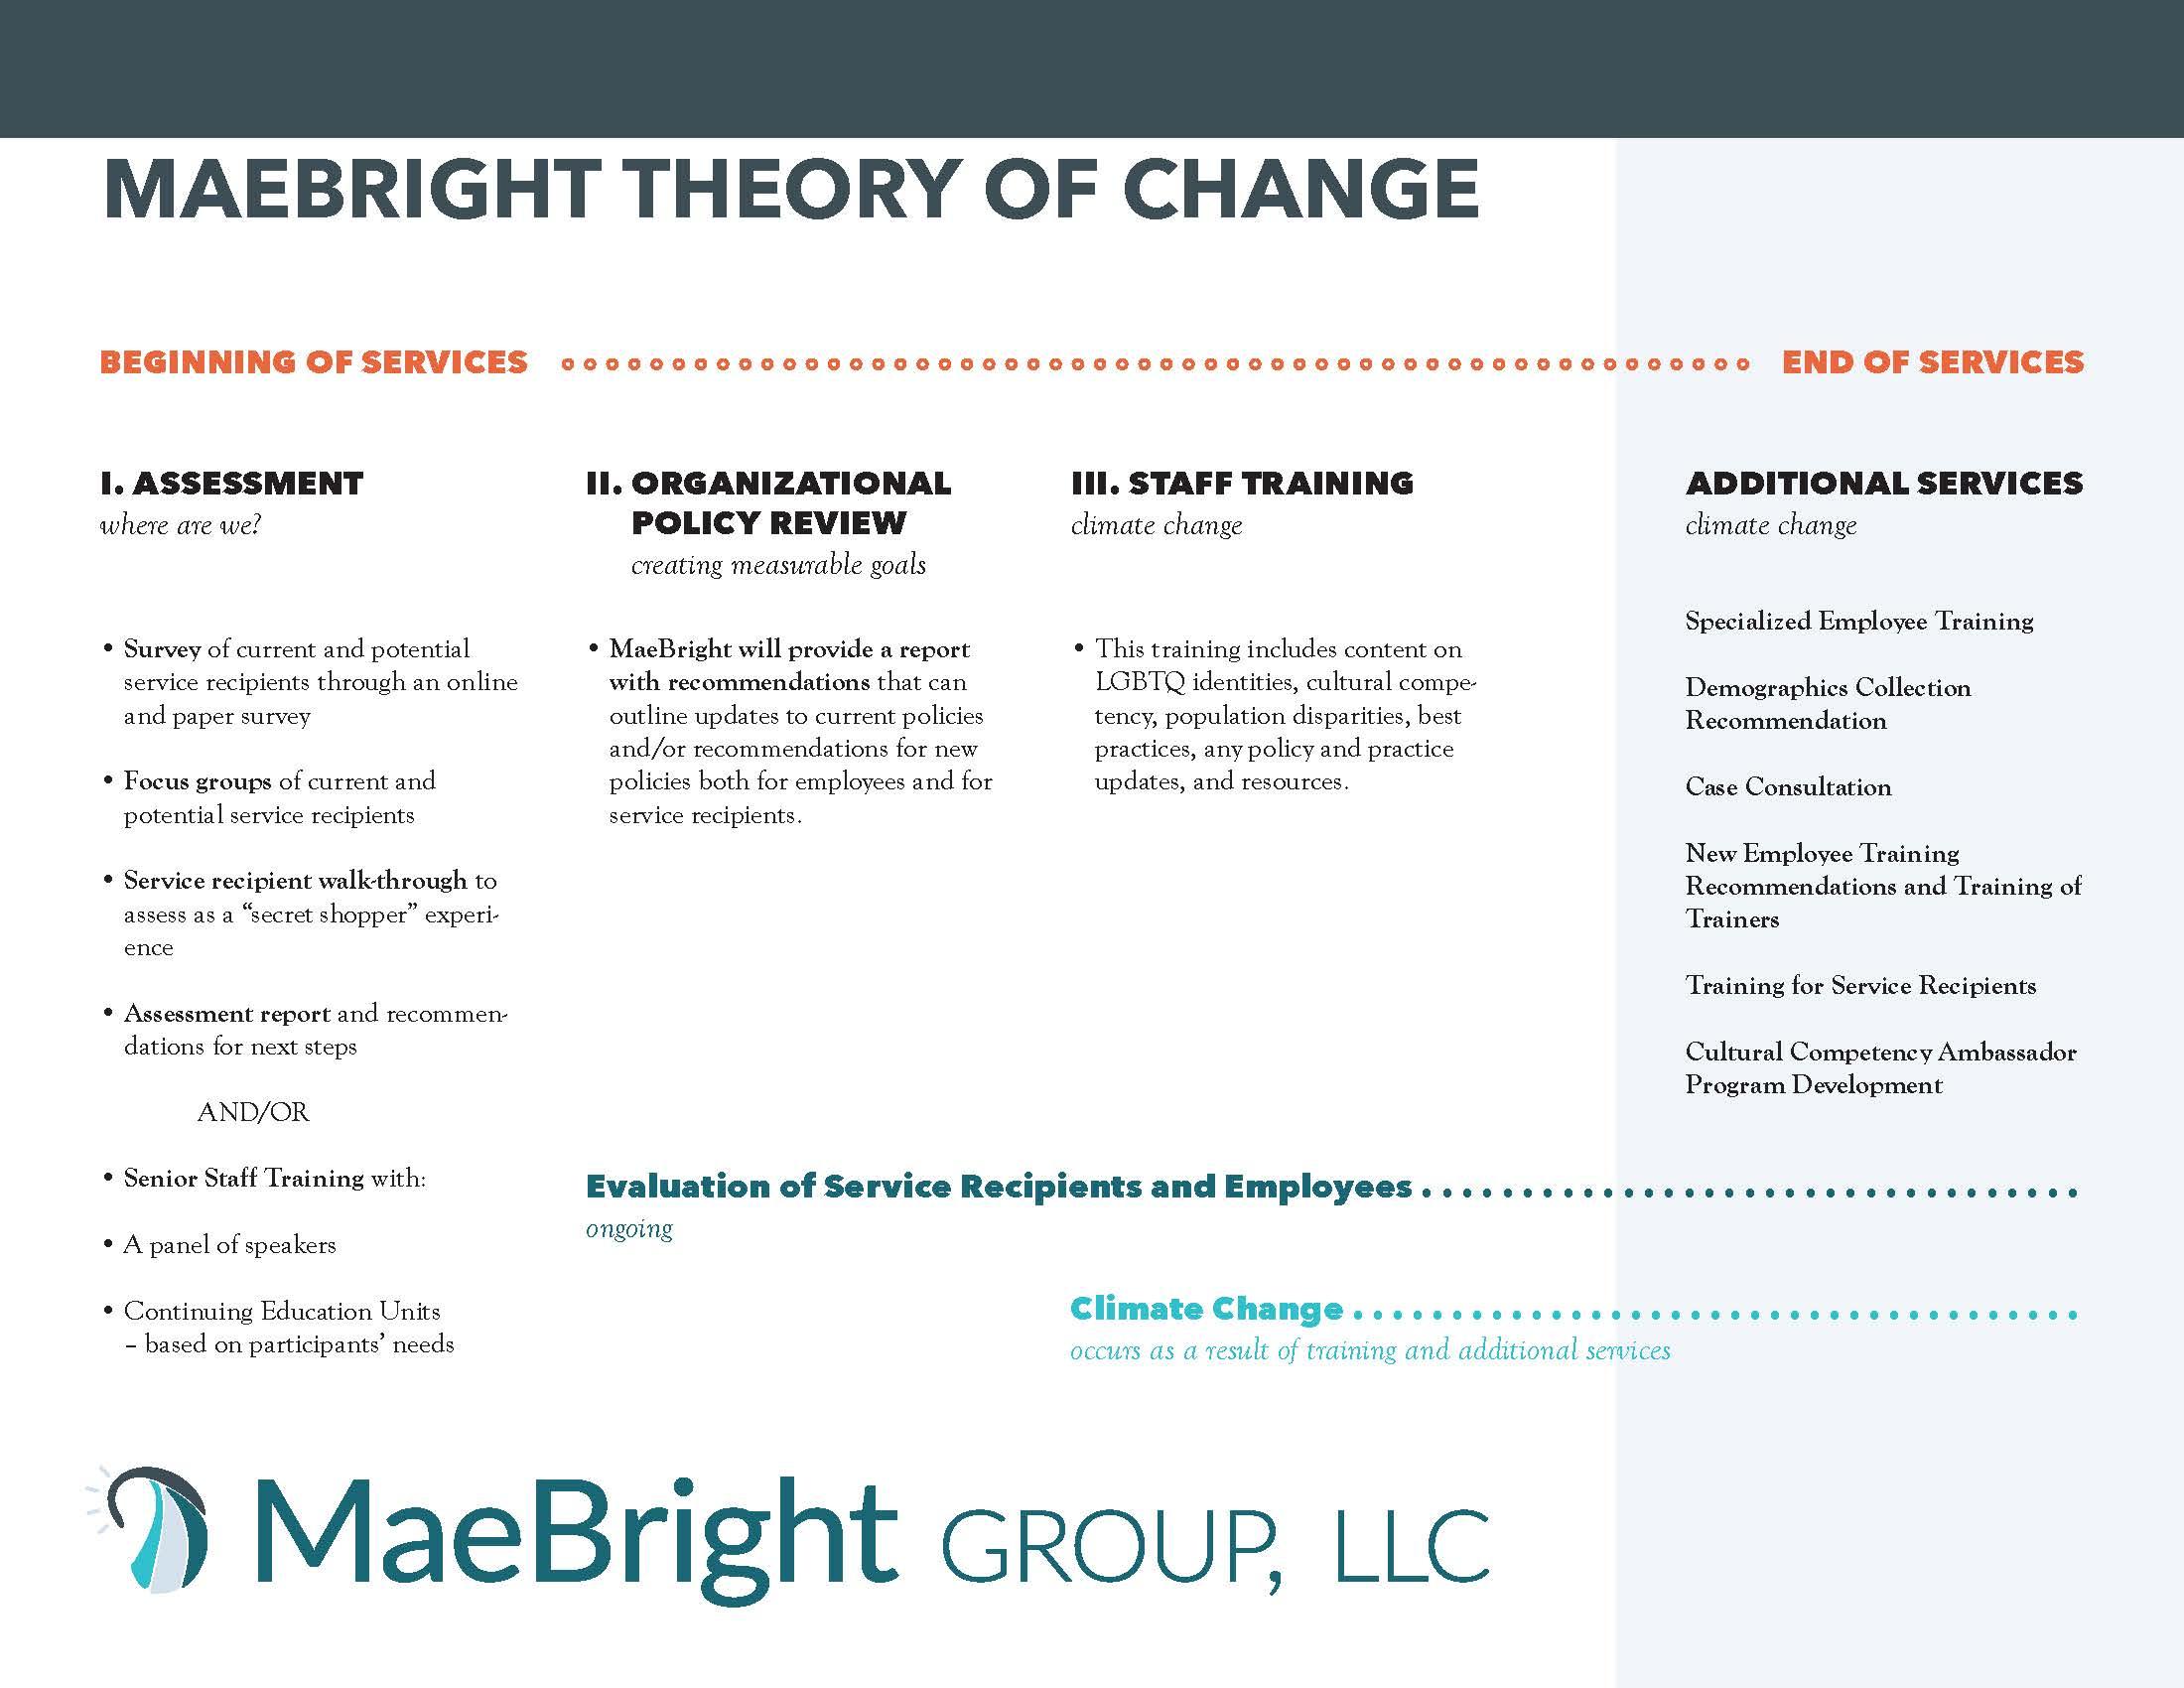 MaeBright Theory of Change.jpg